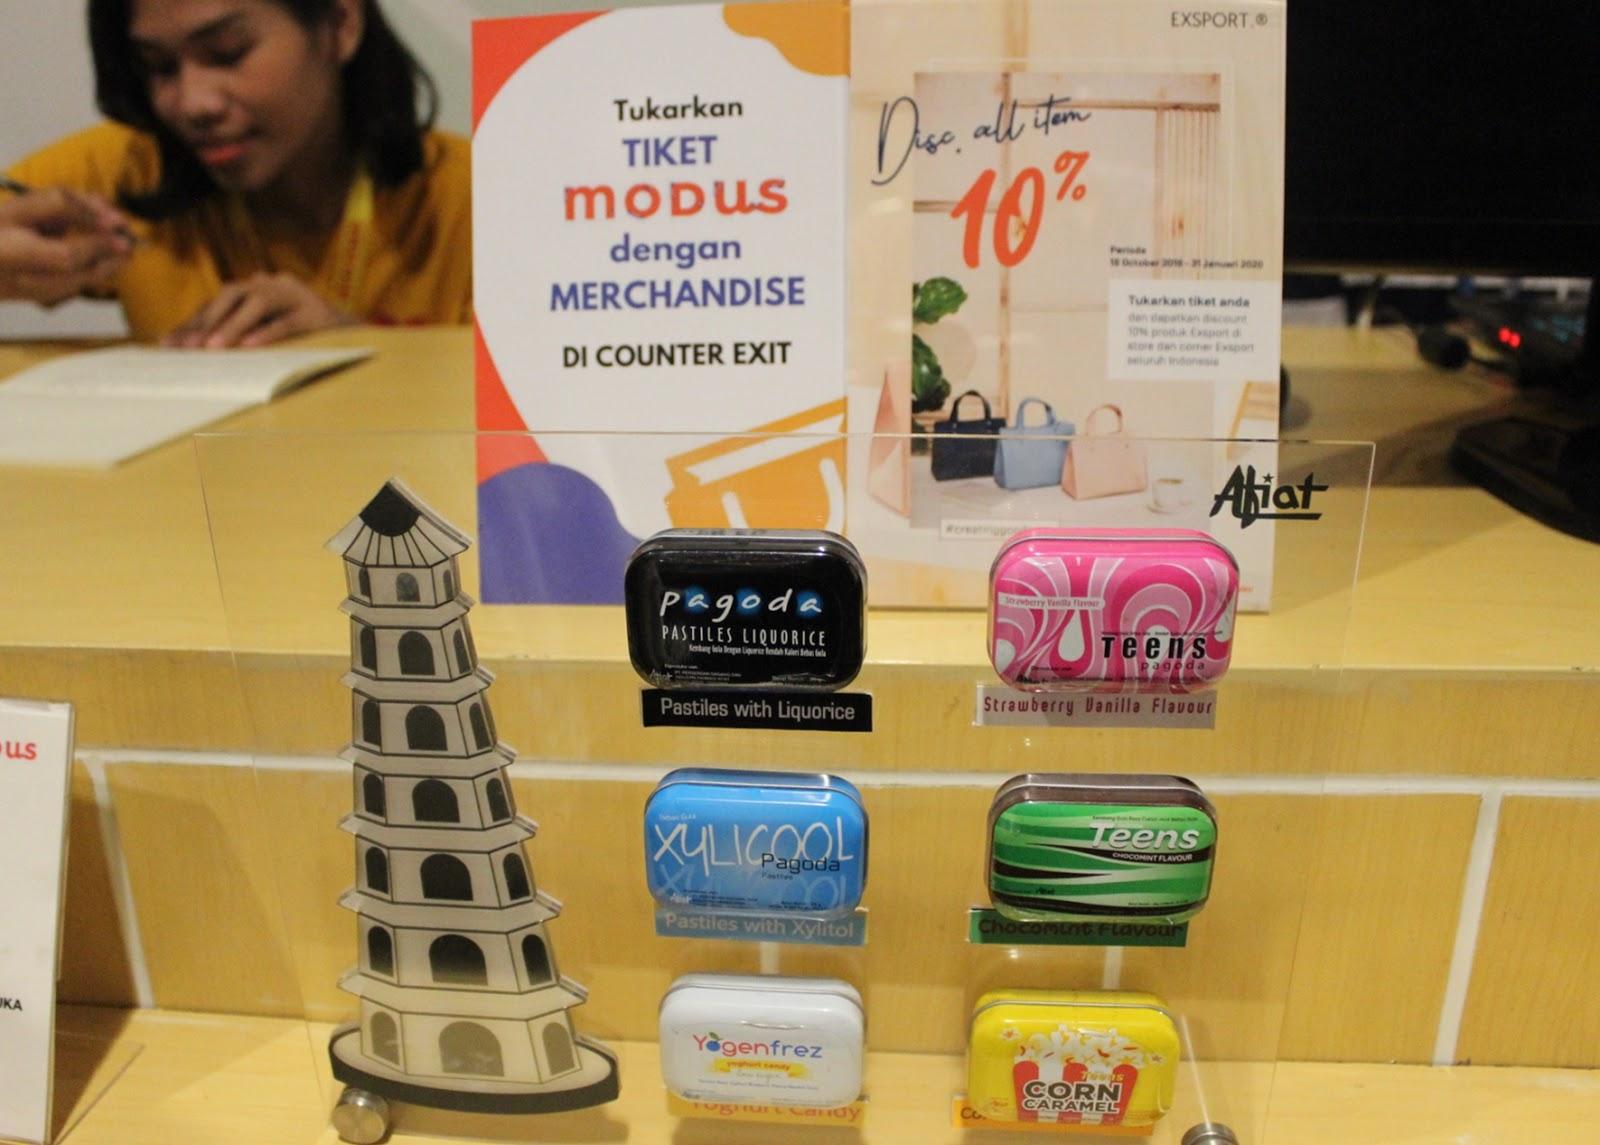 Merchandise Modus Selfie Laboratory